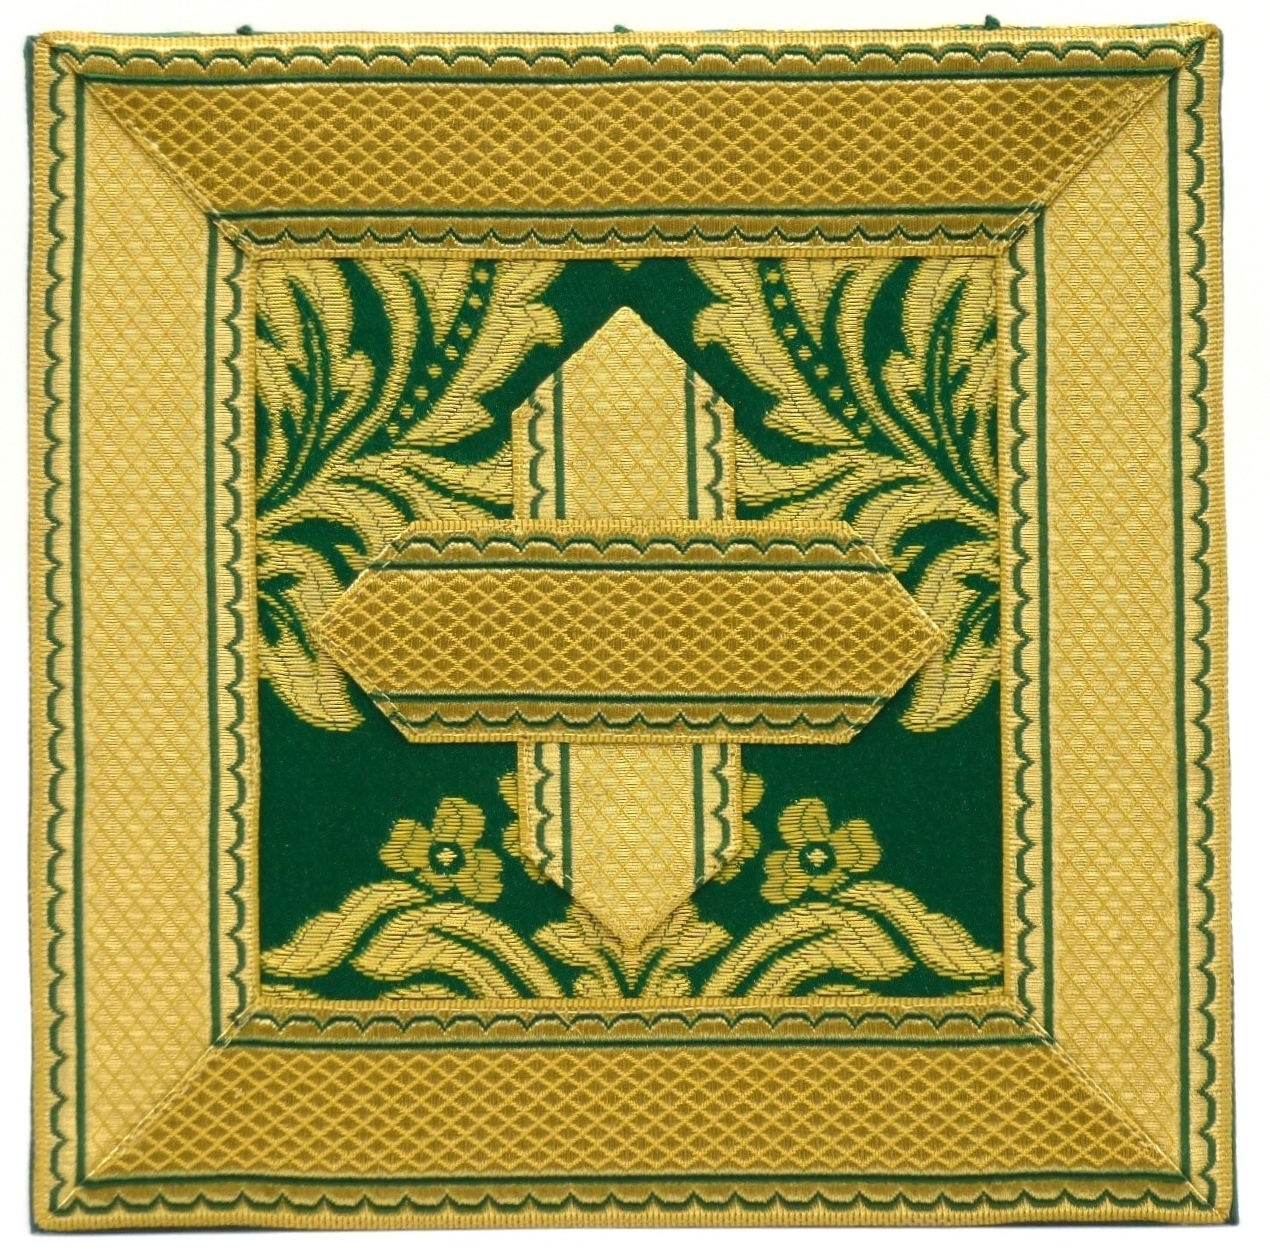 Carpeta o bolsa de corporales verde